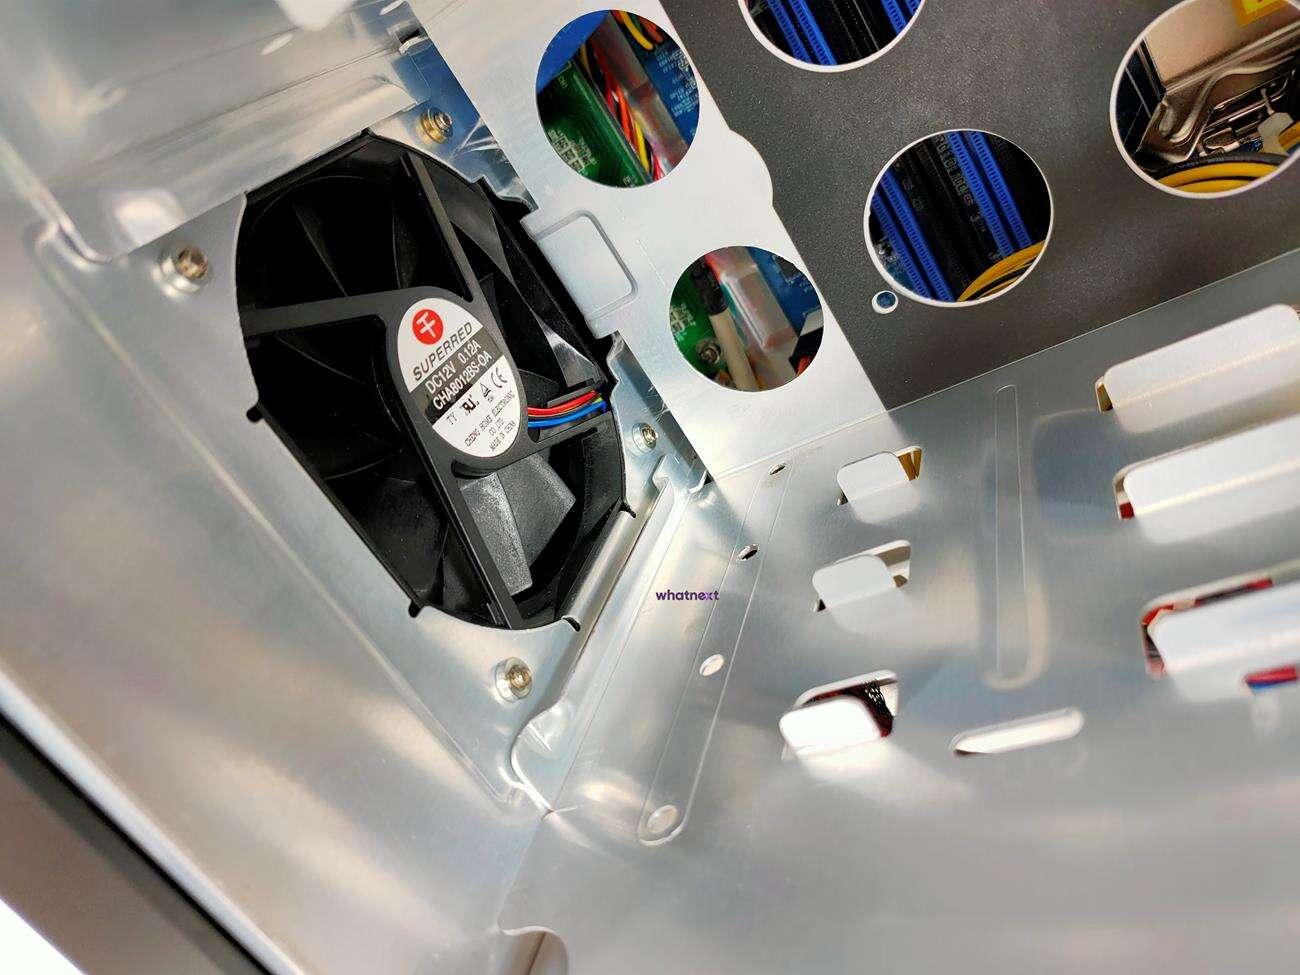 test Shuttle XPC Cube SH370R8, recenzja Shuttle XPC Cube SH370R8, review Shuttle XPC Cube SH370R8, opinia Shuttle XPC Cube SH370R8